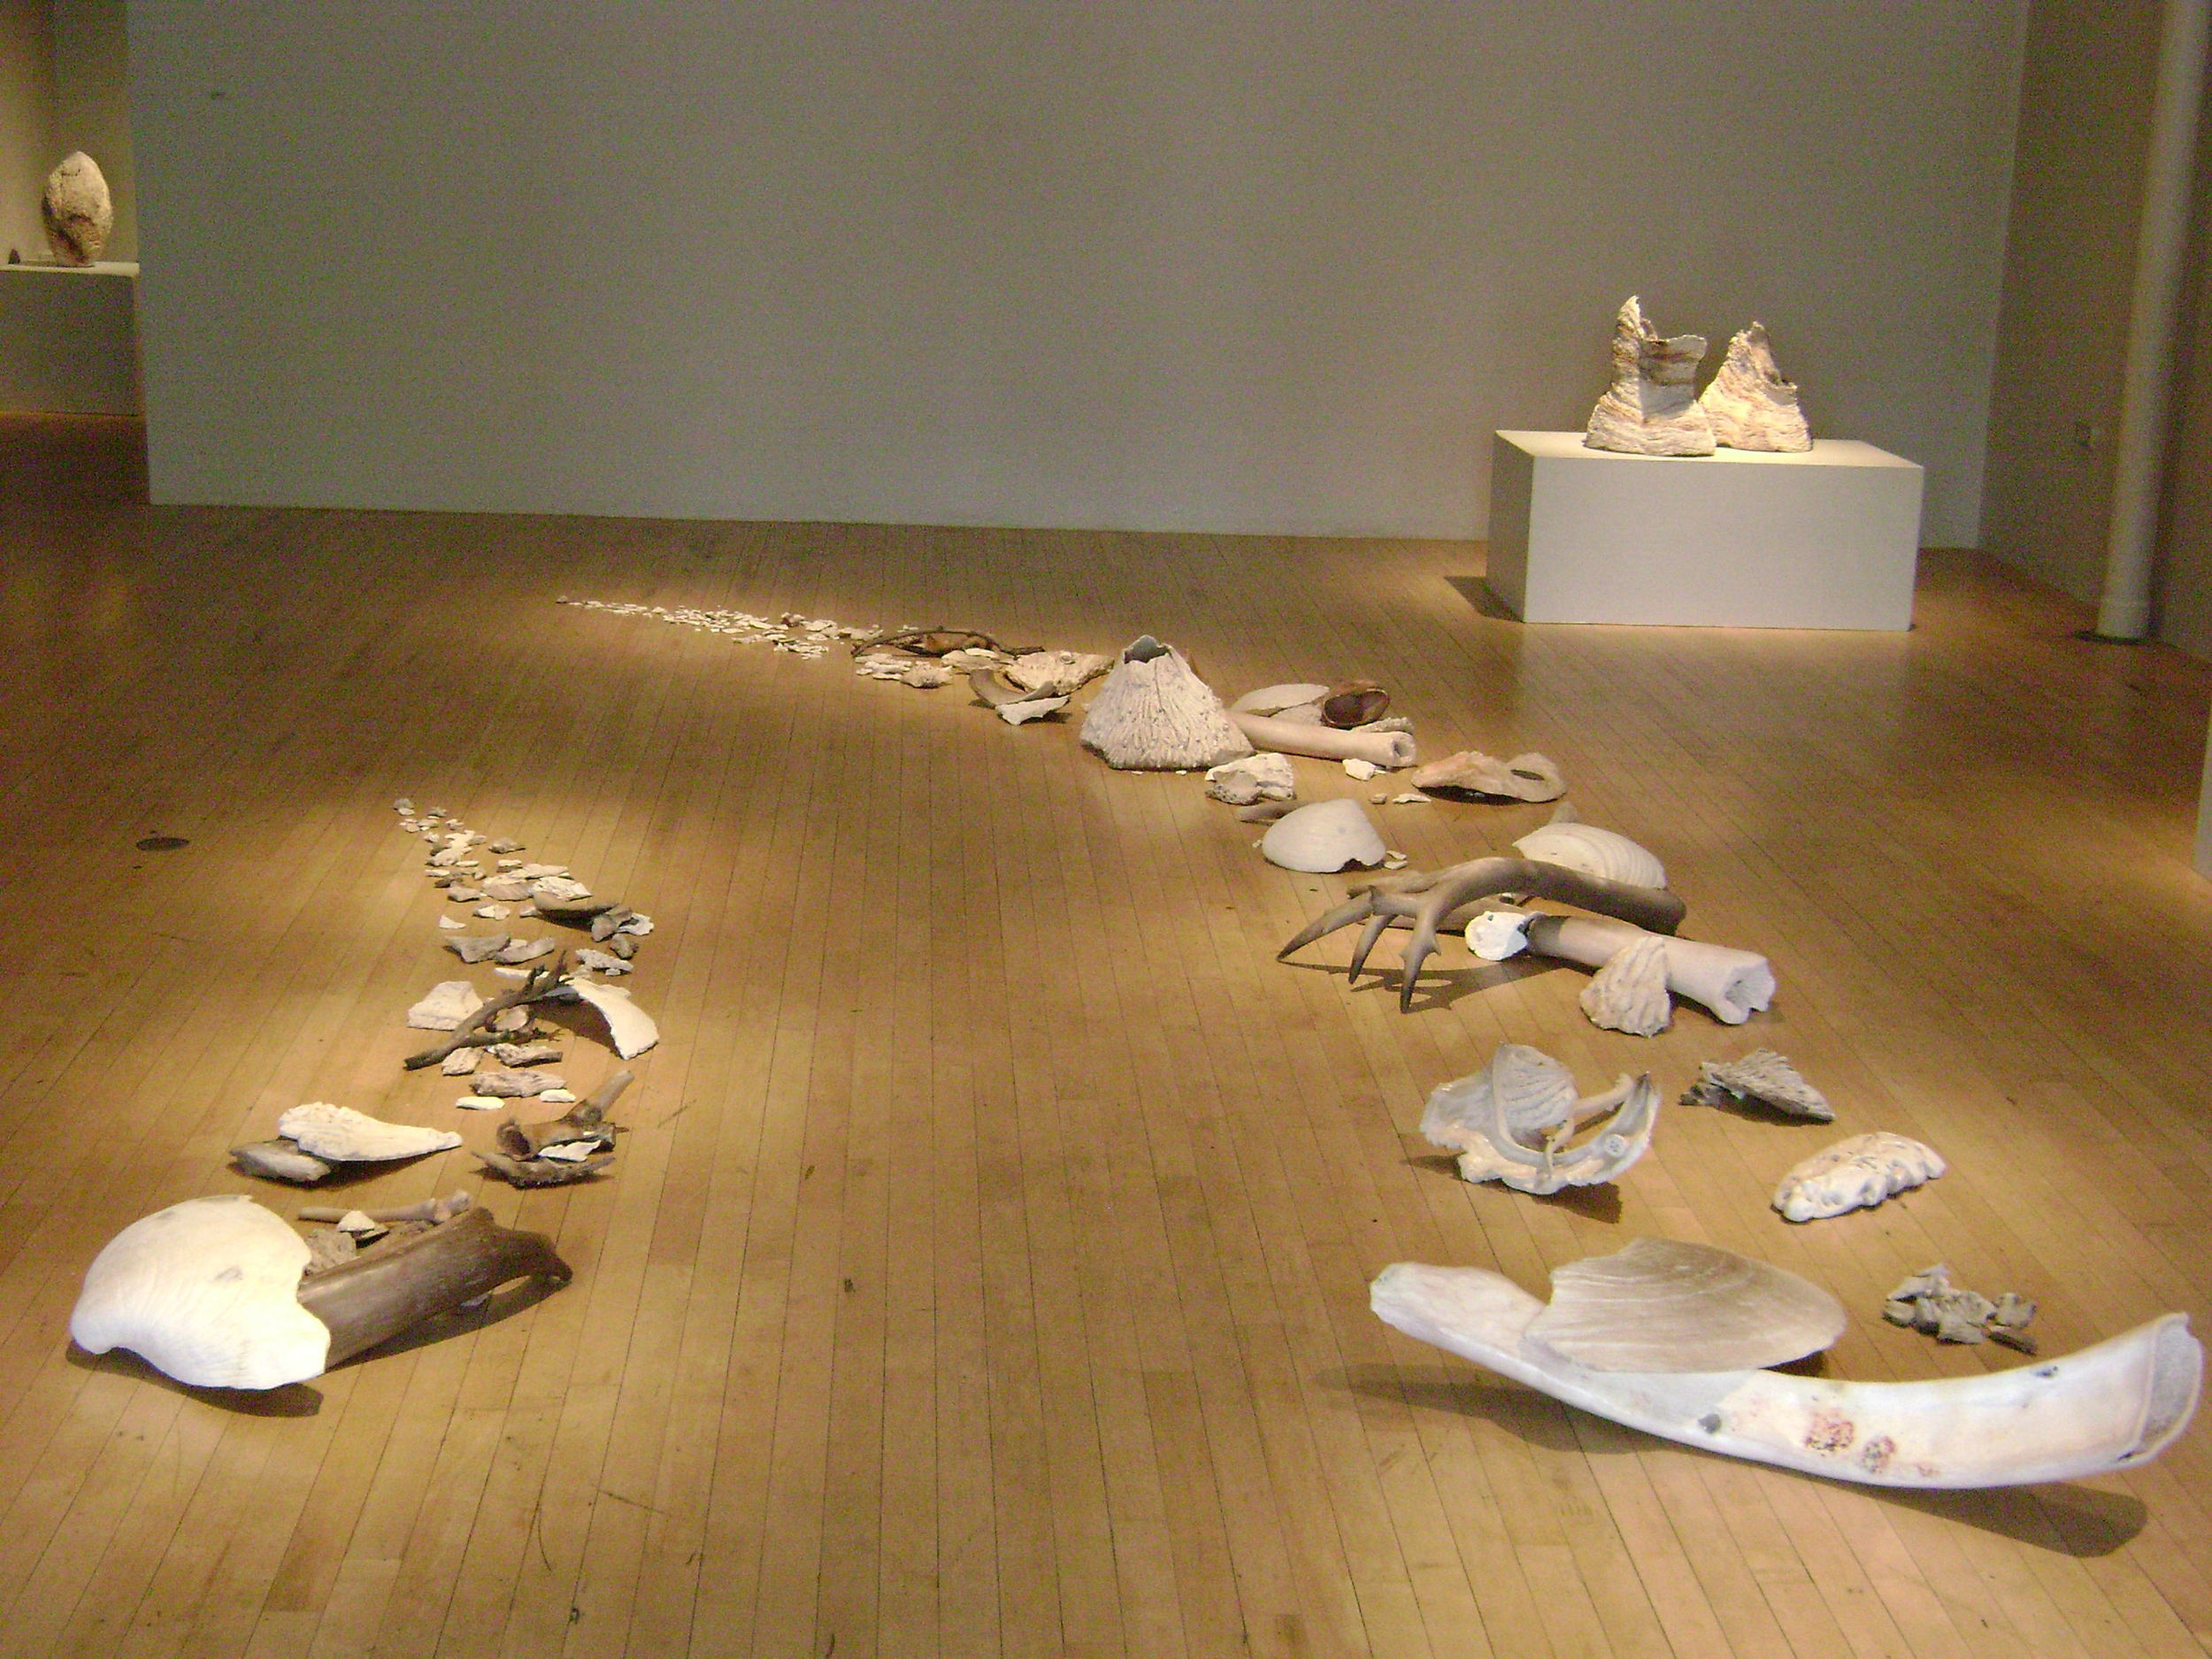 Shorelife/Ebbtide , detail    Catherine Person Gallery, Seattle      Strata, s olo show,  2008